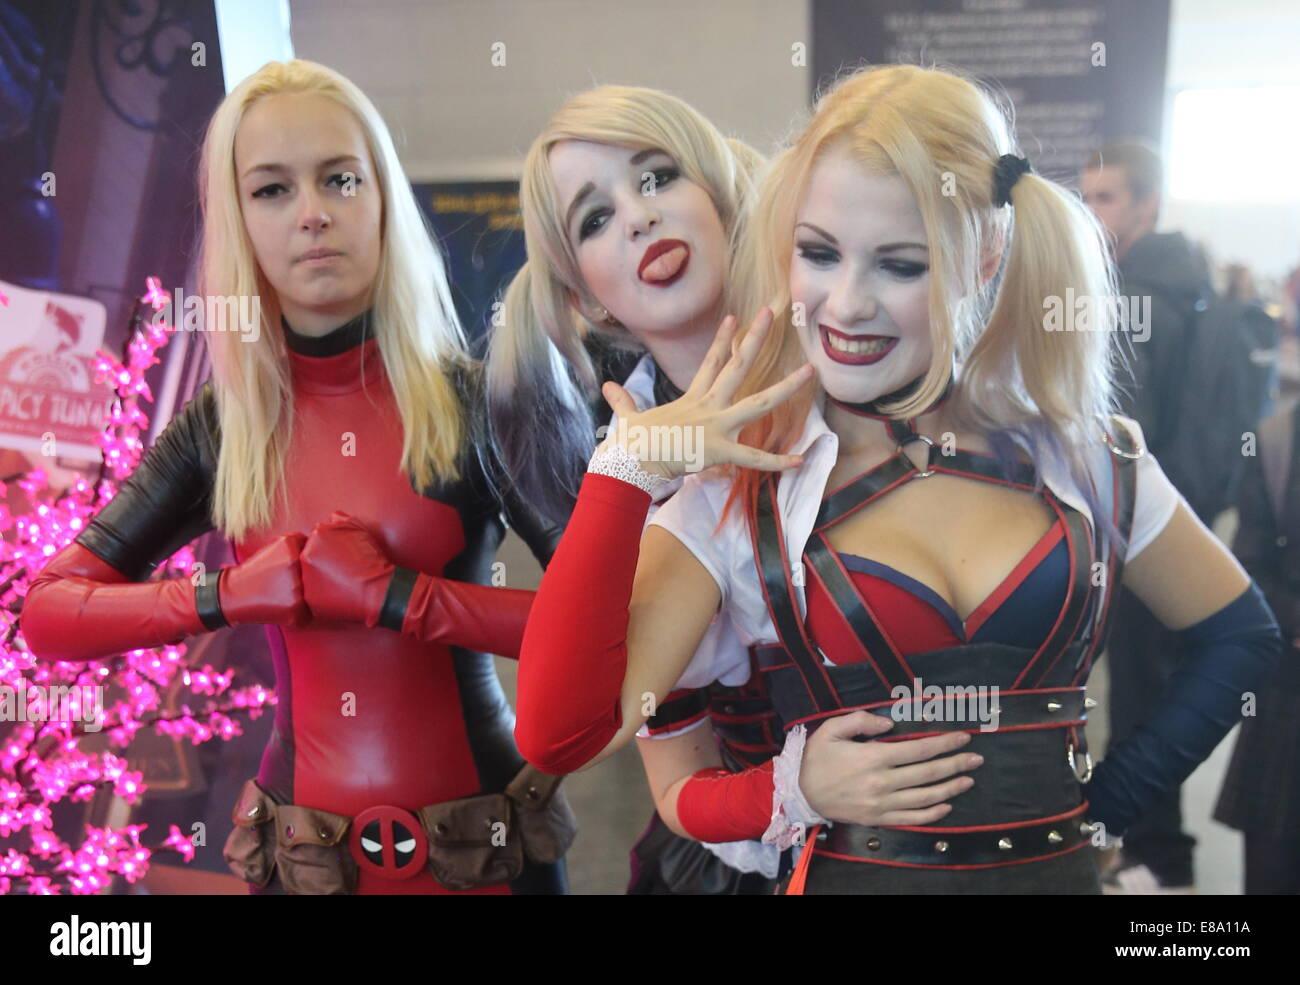 Moskau, Russland. 2. Oktober 2014. Cosplayer Teilnahme 2014 Comic ...